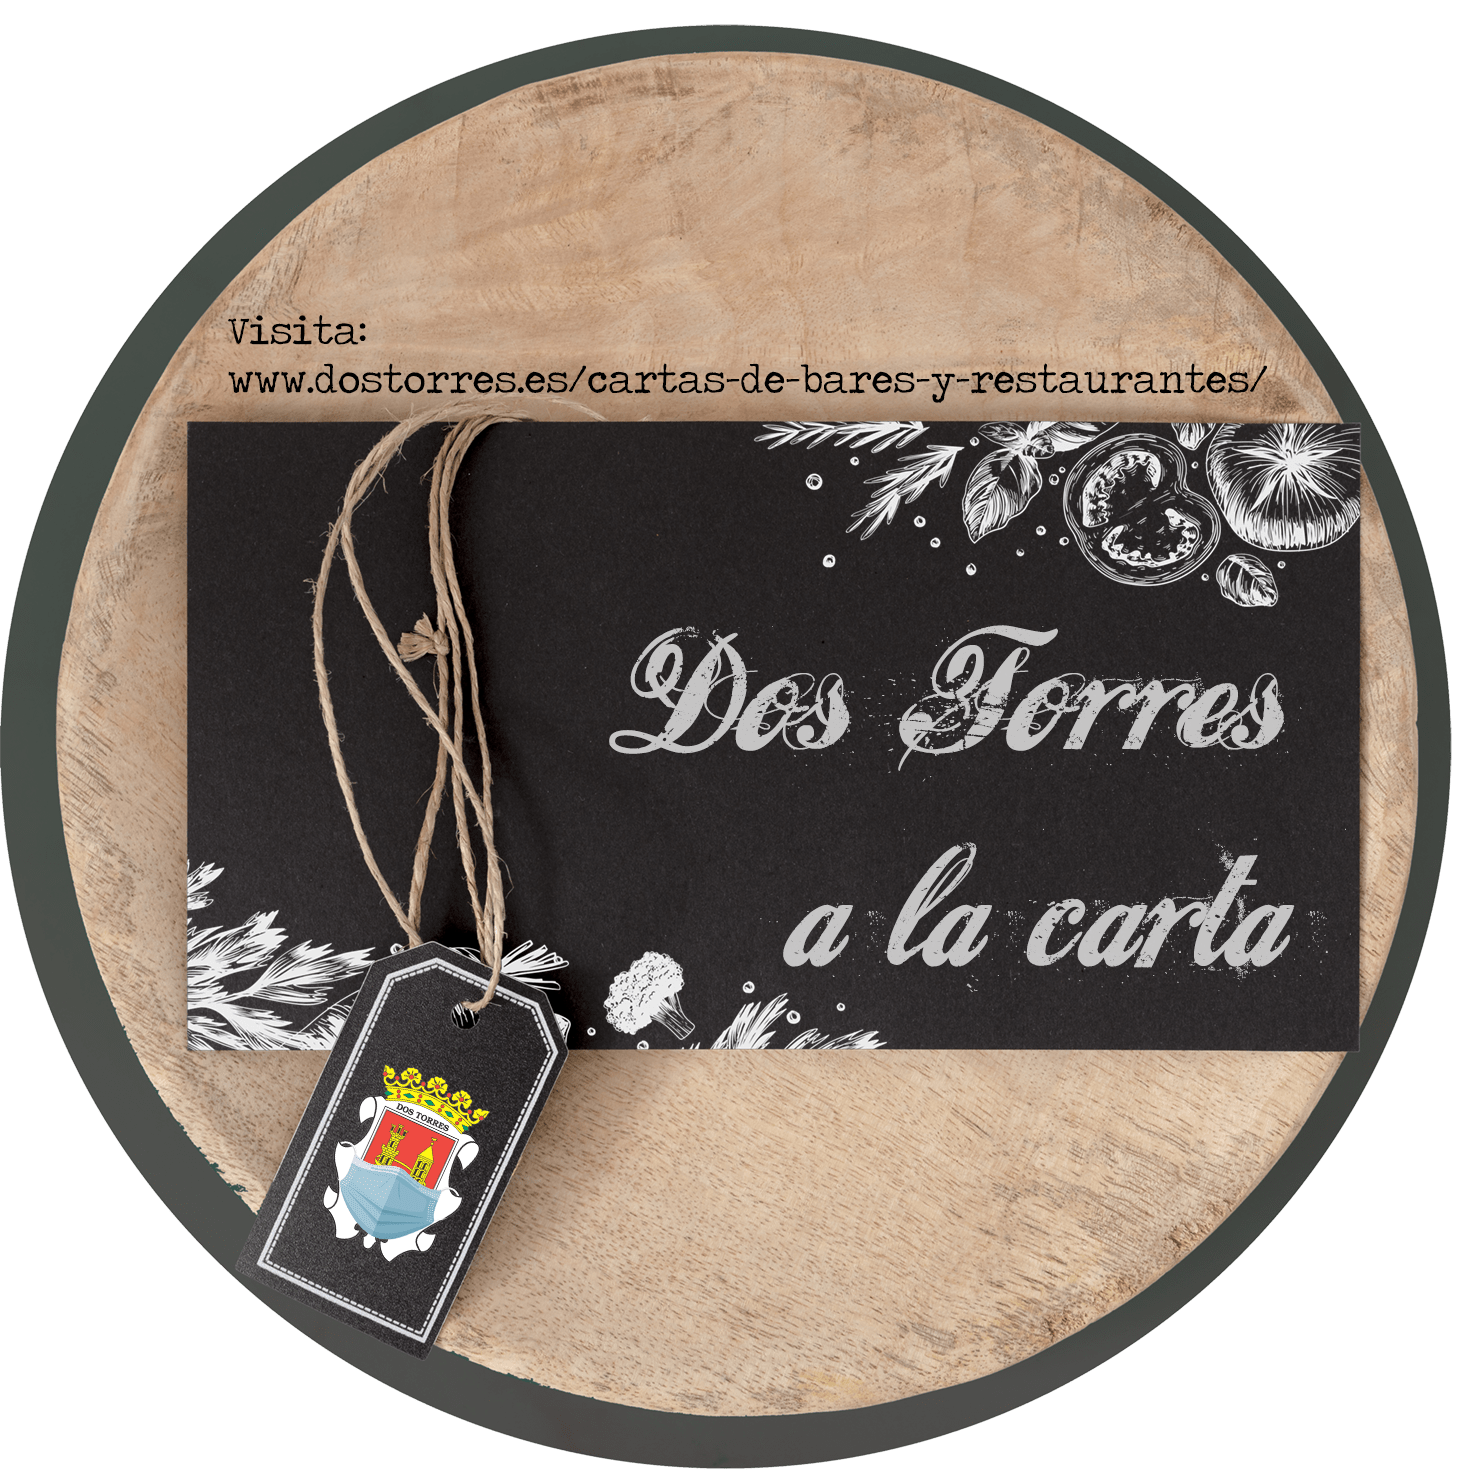 DOS TORRES A LA CARTA